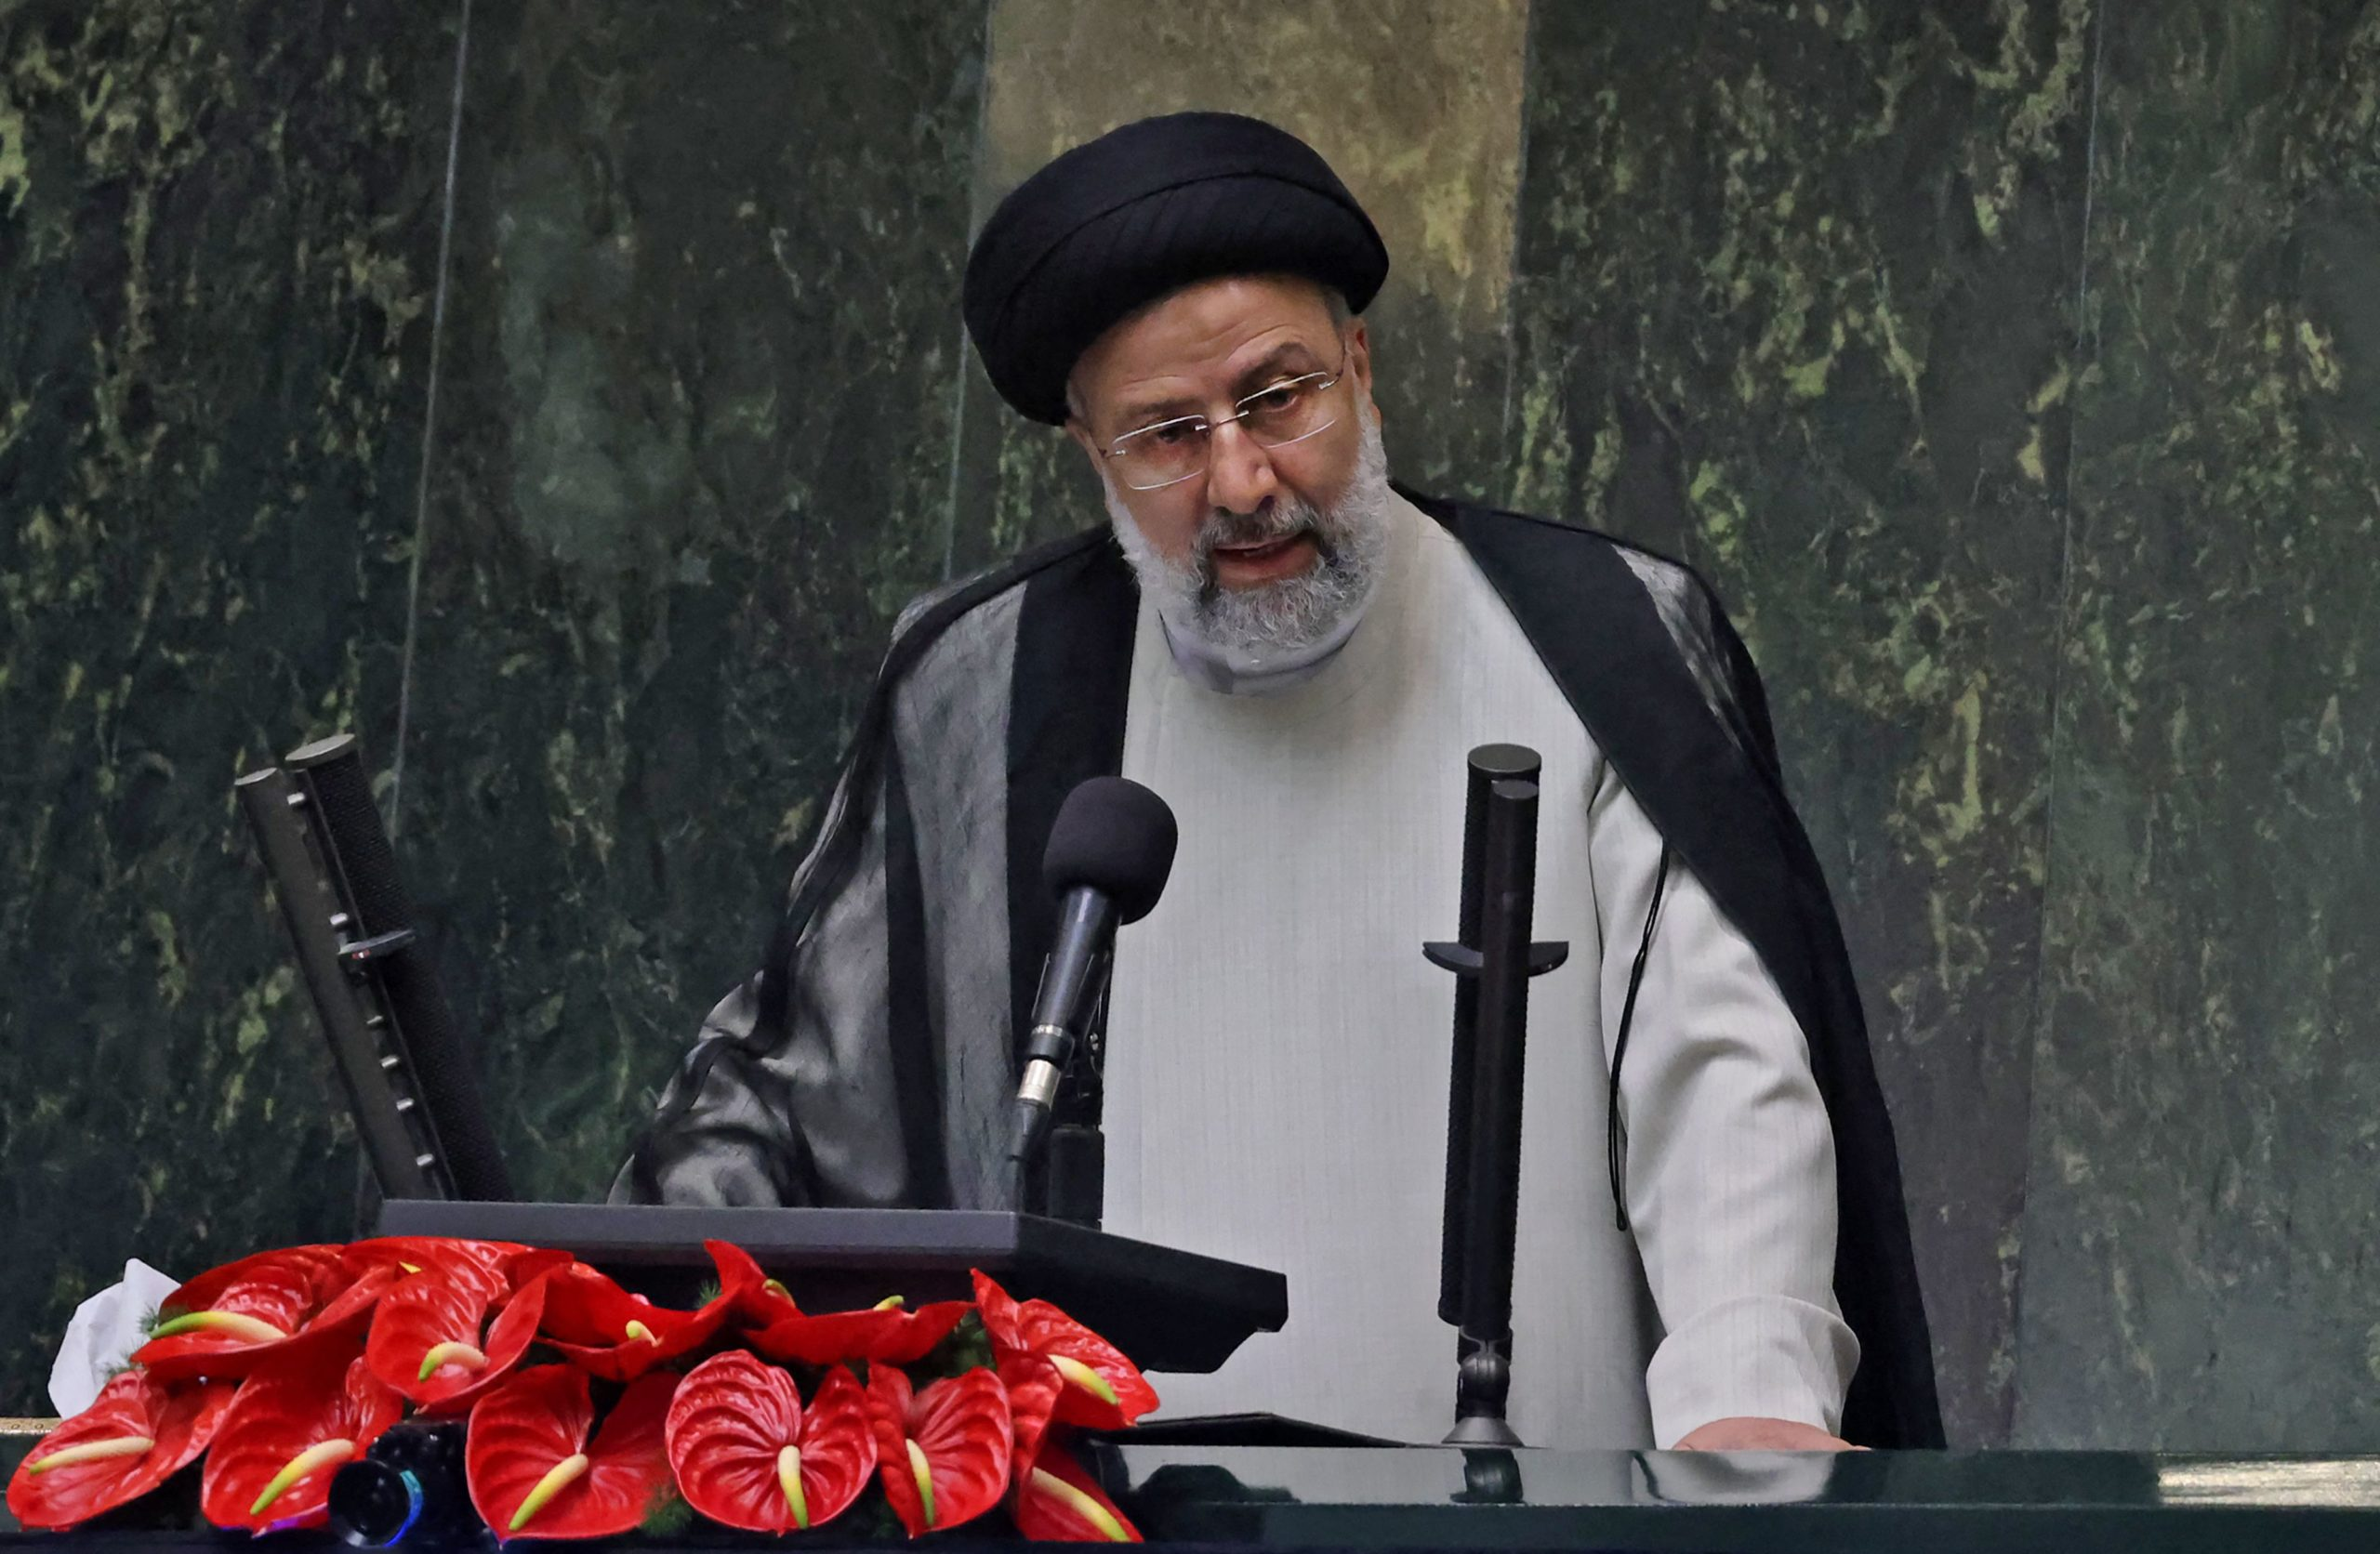 Iranian President Ebrahim Raisi addresses his nation's parliament on Aug. 5. (Atta Kenare/AFP via Getty Images)